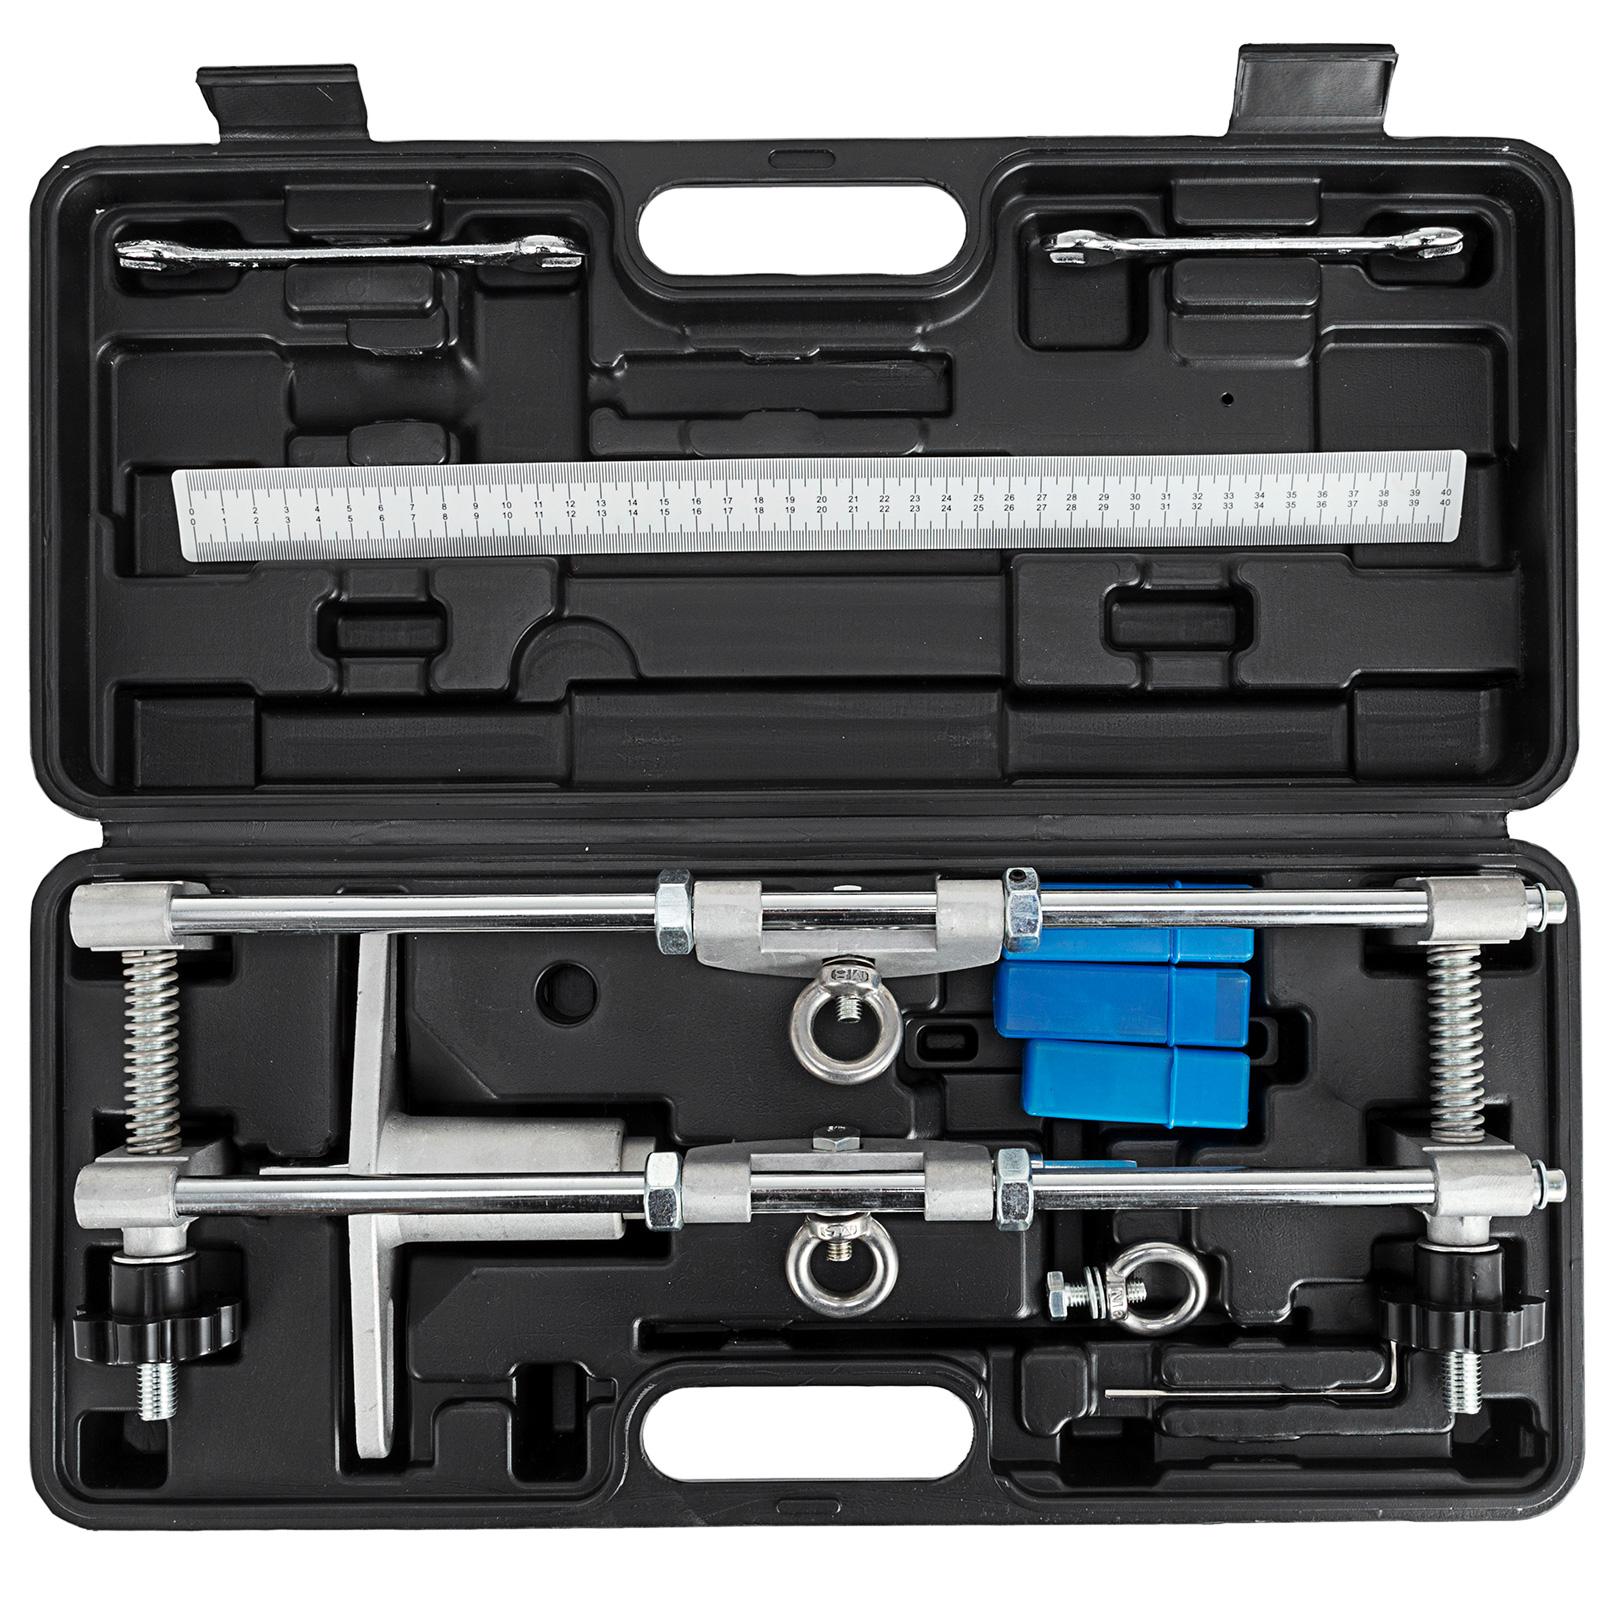 Set Serrure à Mortaise Raccord Porte Serrure Mortiser Kit 3 Cutters 18//22//25mm